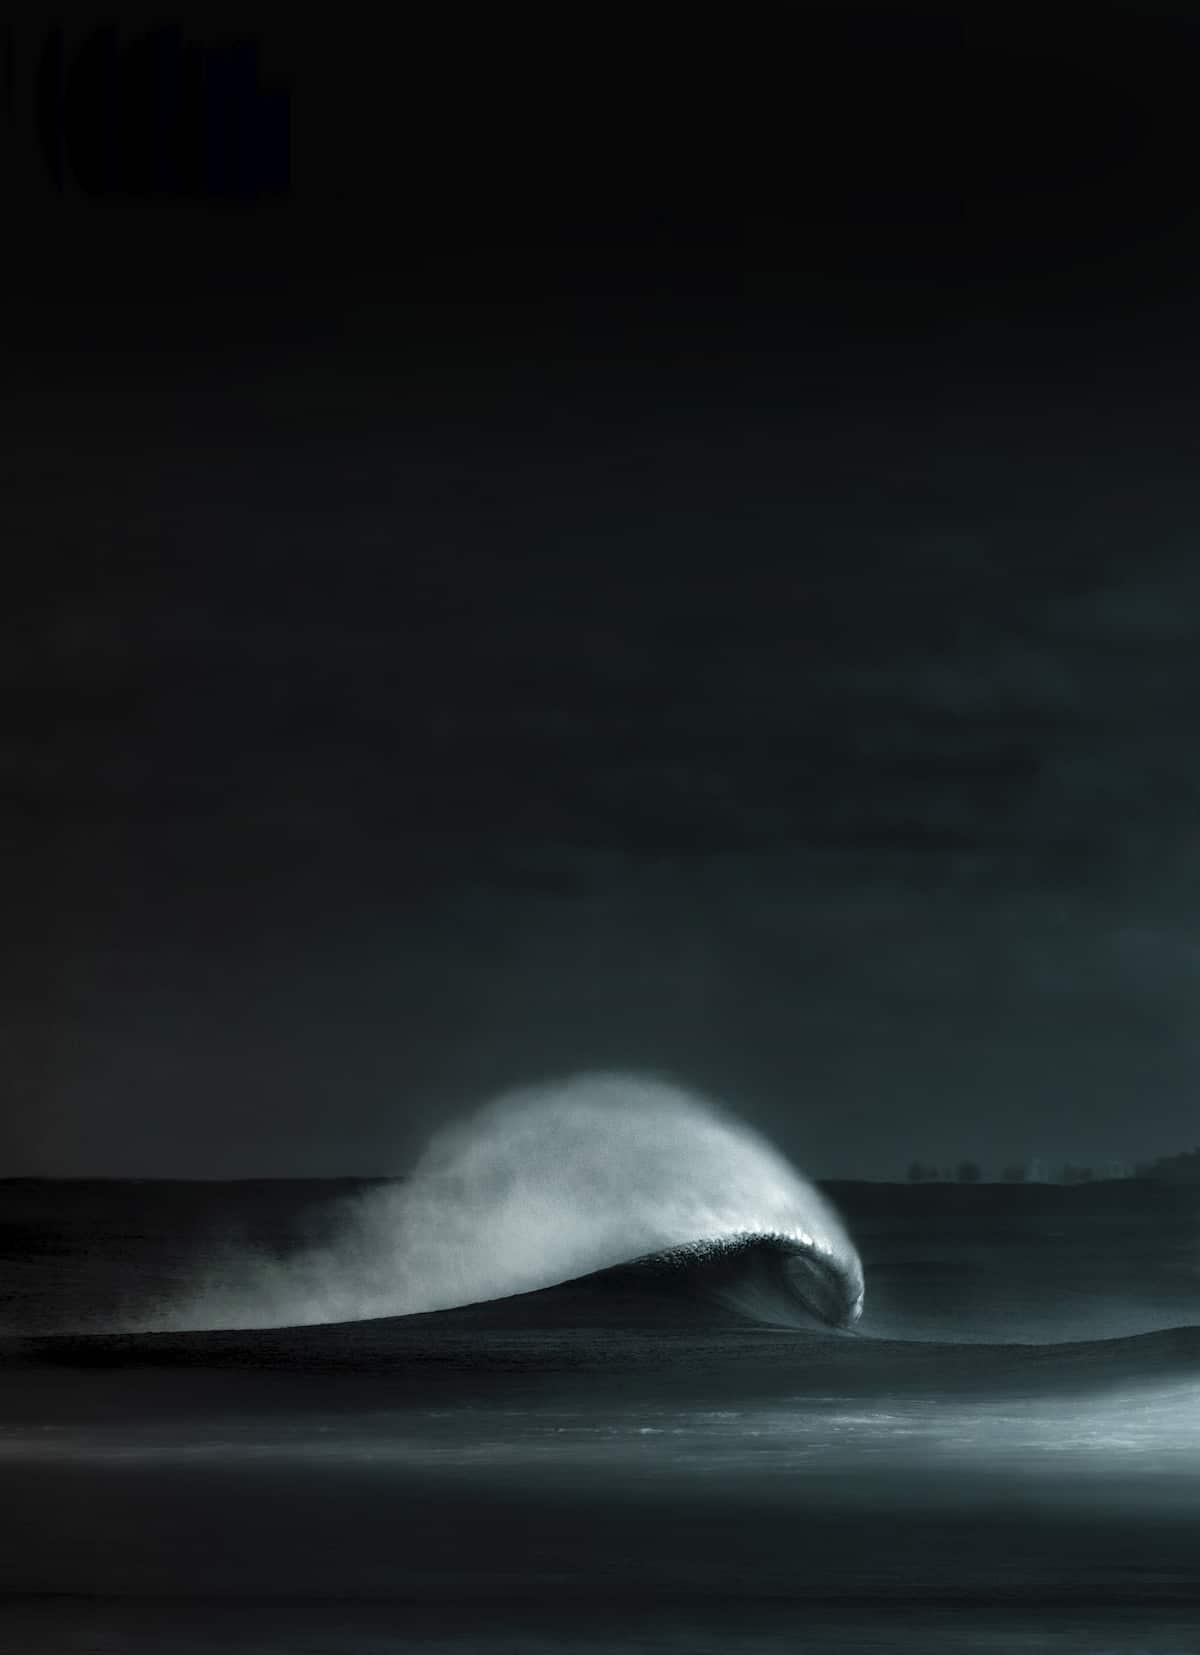 """Flume"" por Paul Smith, Finaliste 2020 Nikon Surf Photography"